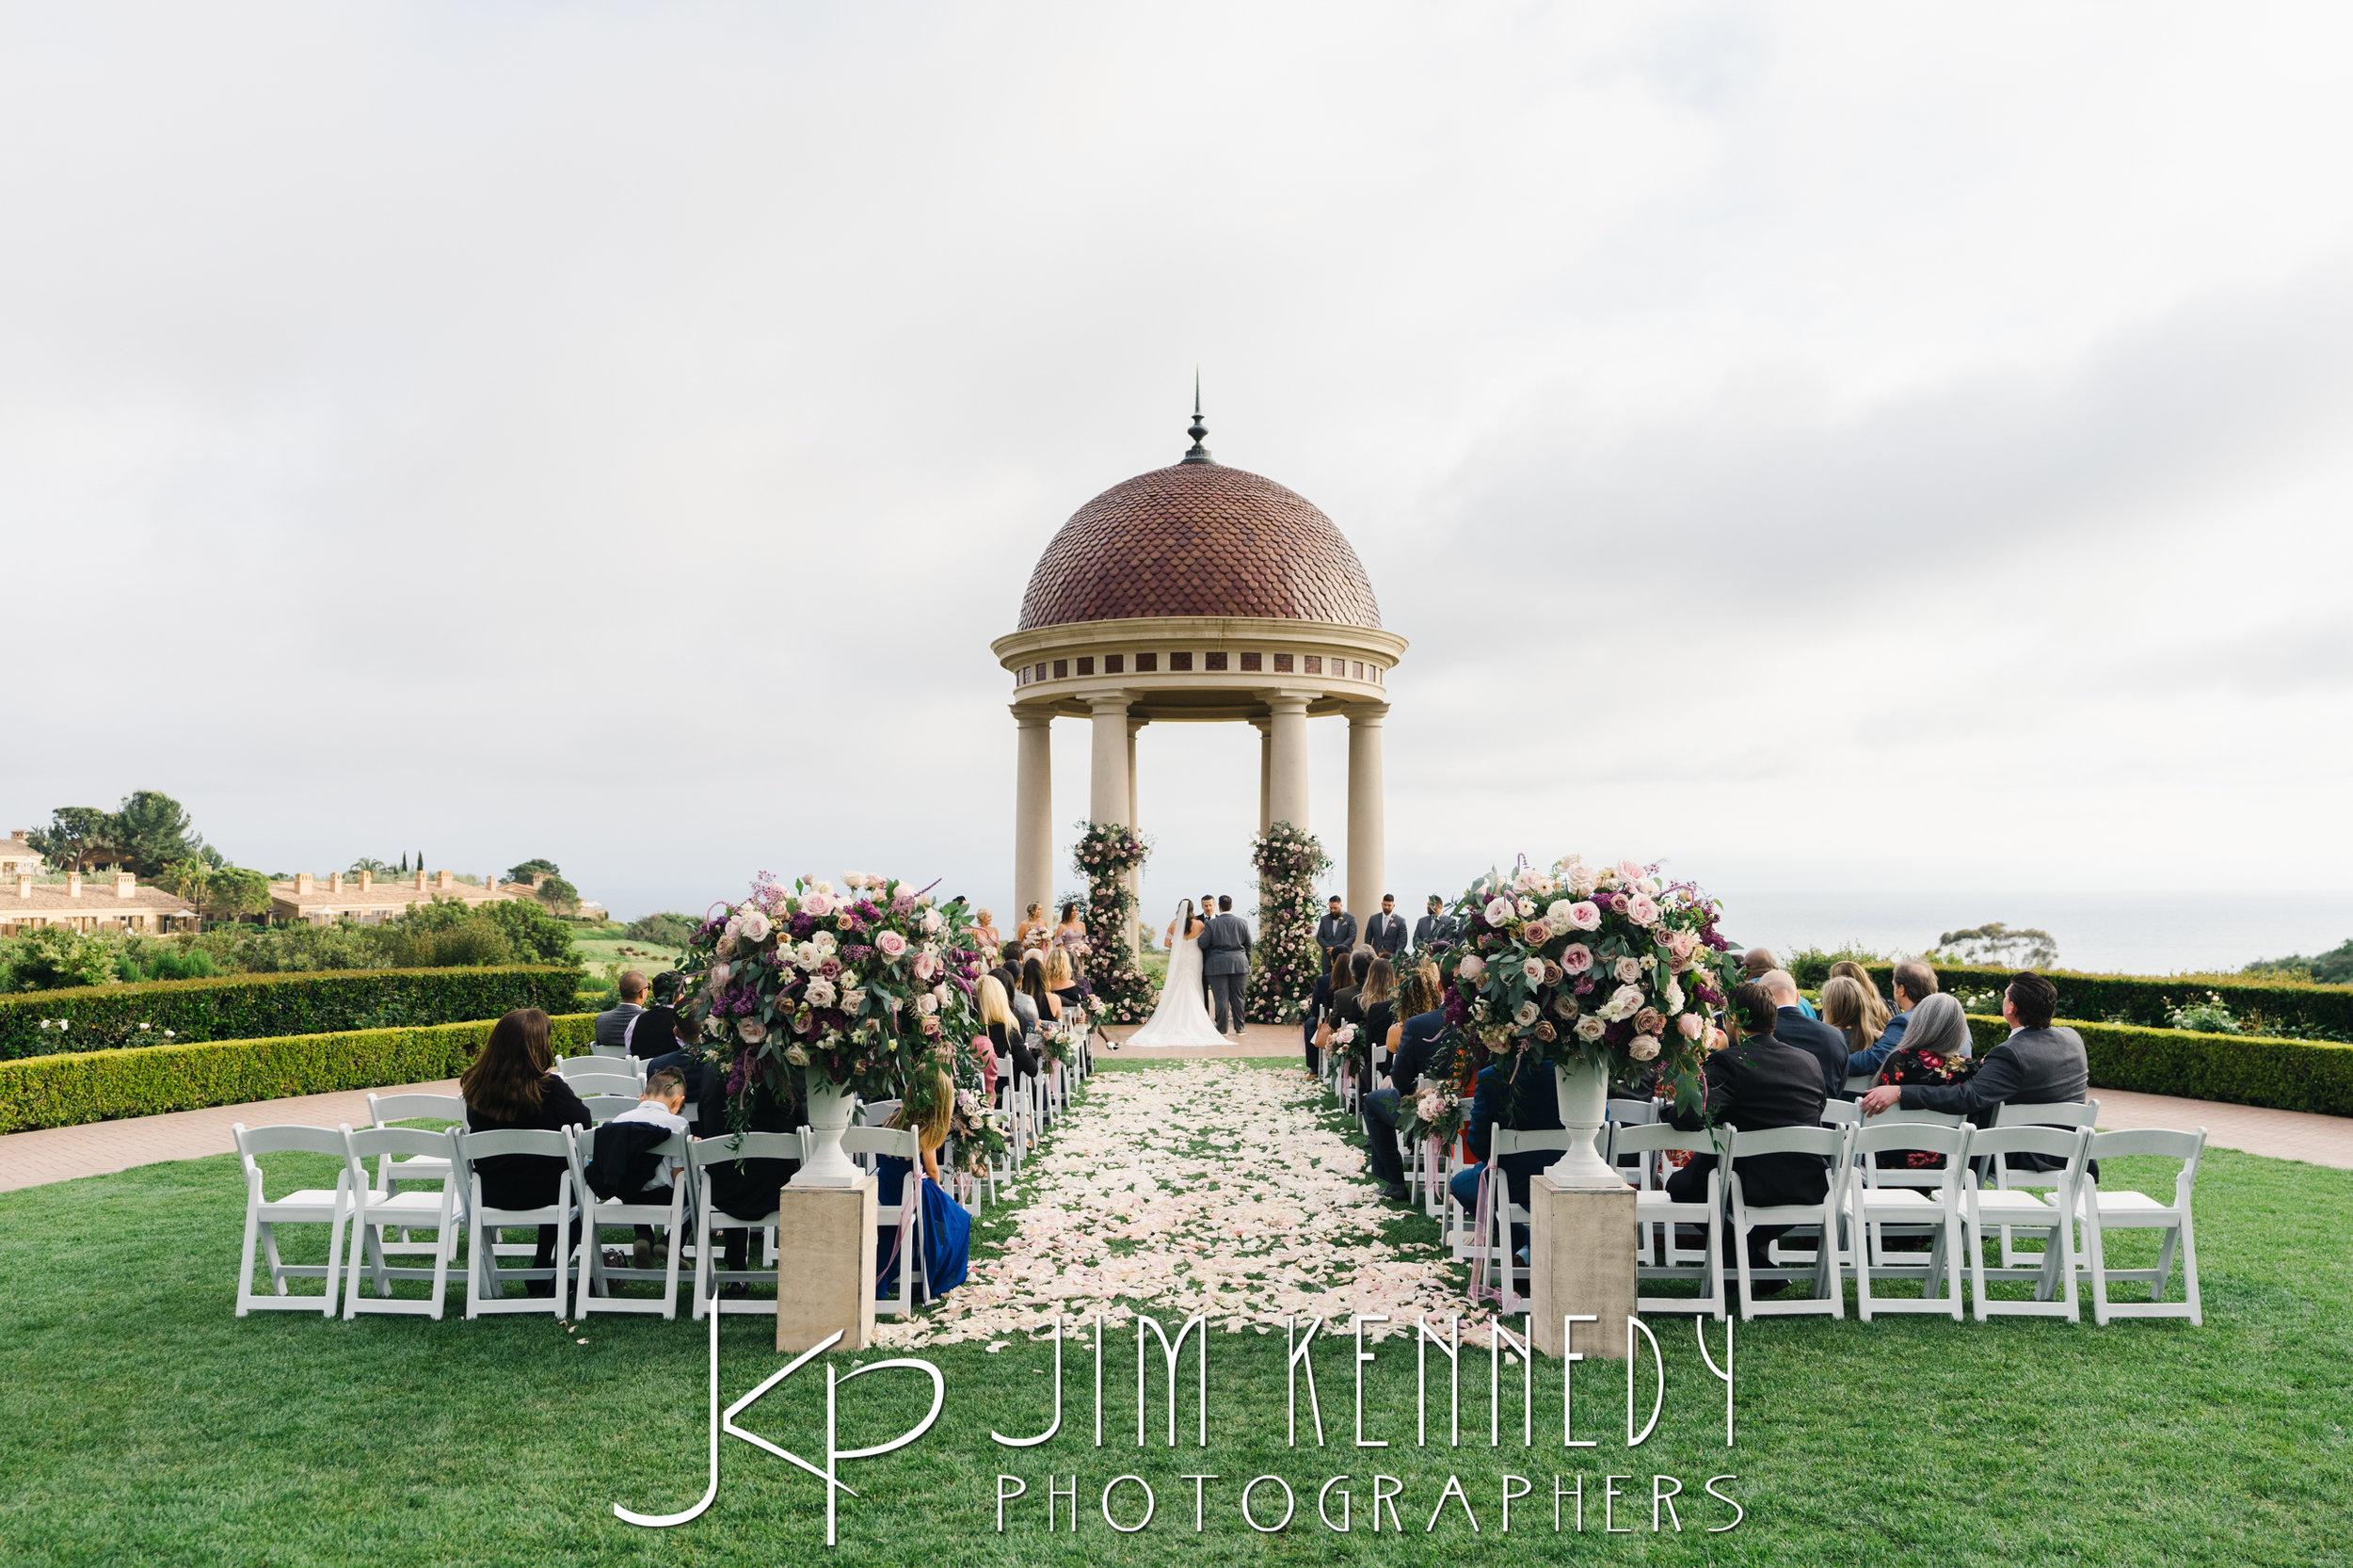 pelican-hill-wedding-jim-kenedy-photographers_0114.JPG